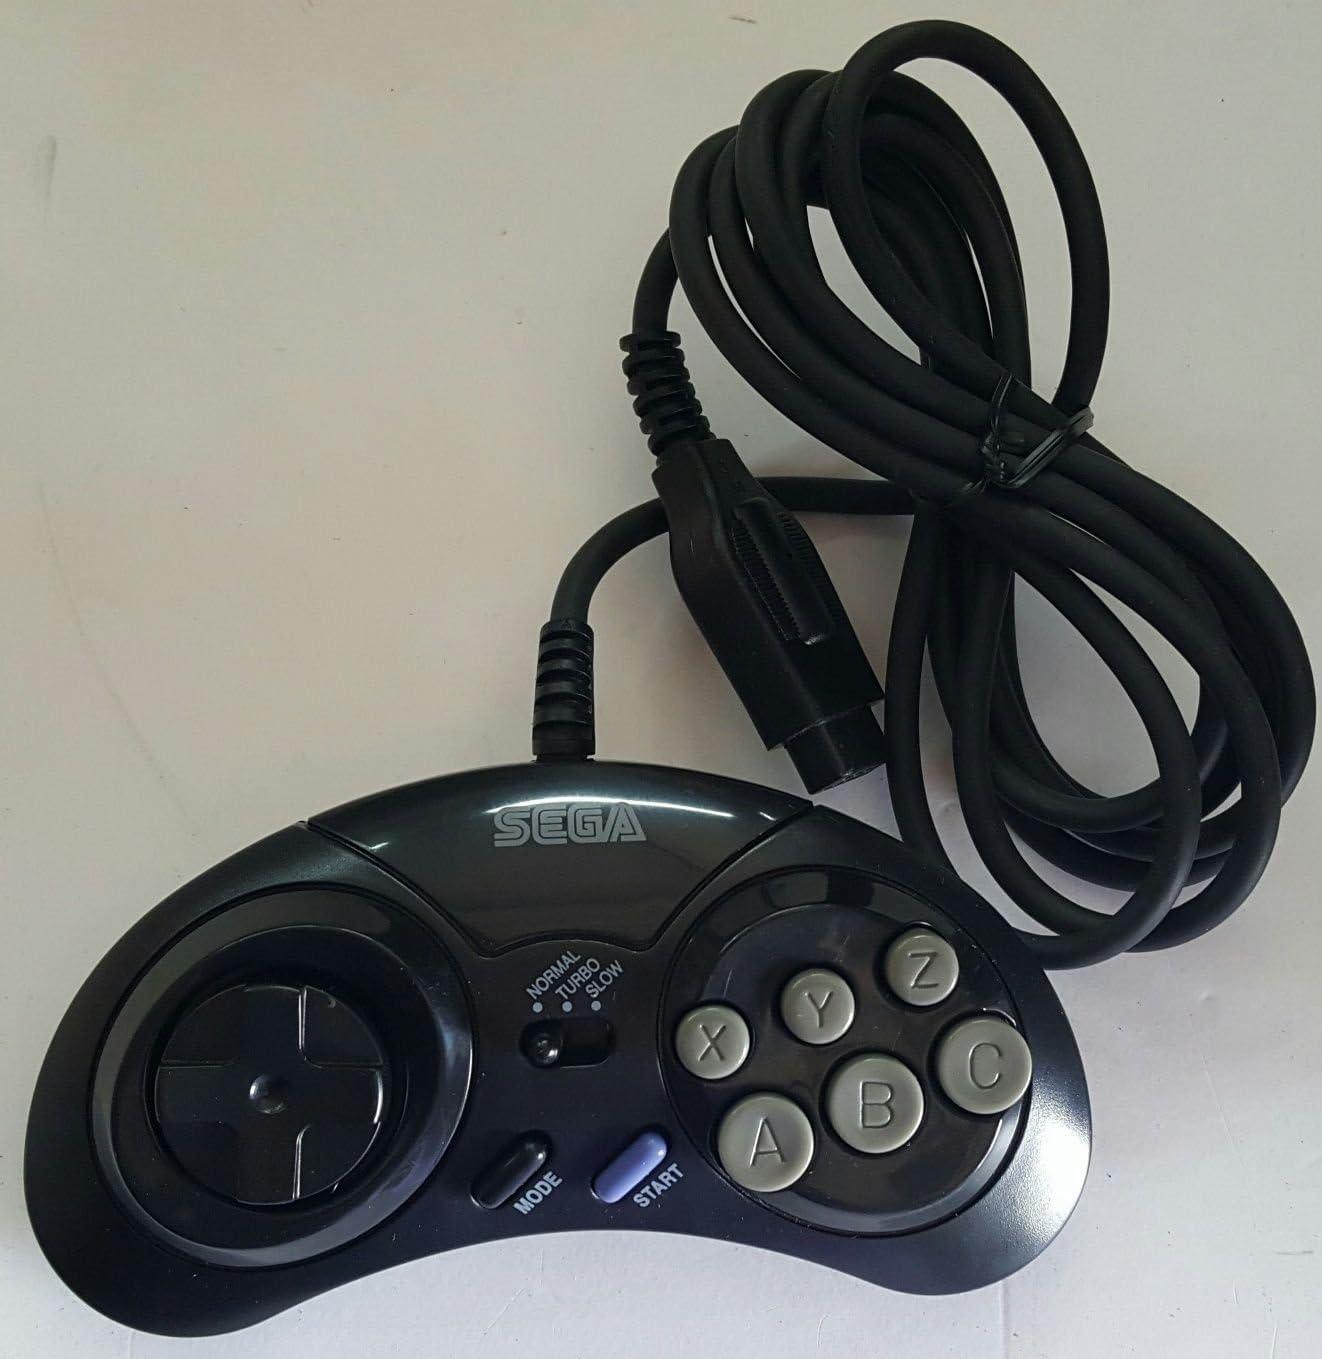 tested Mk-1470 Arcade pad Vintage game Controller Sega Genesis 6 Button Turbo Controller Original